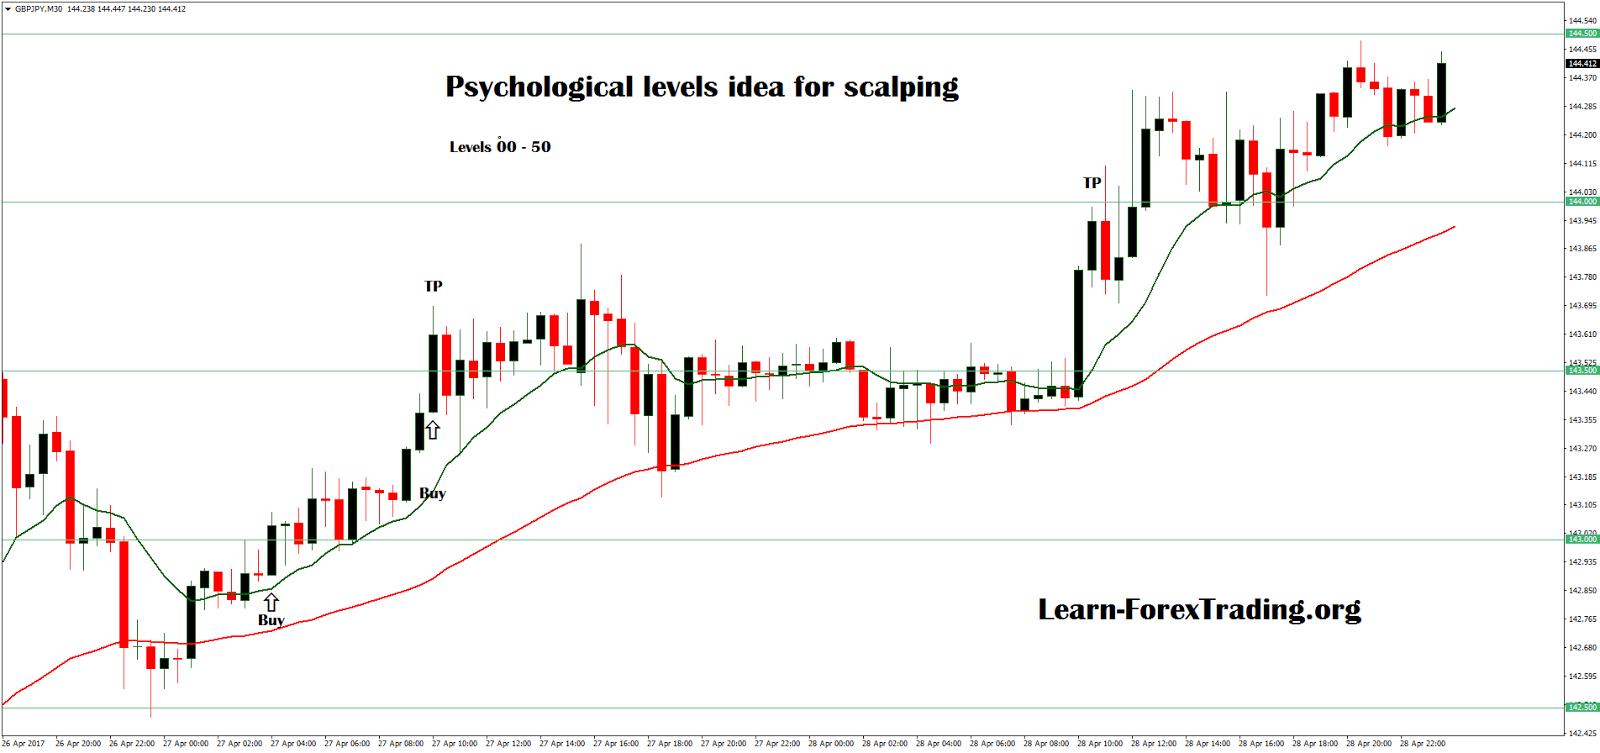 Psychological levels forex indicator